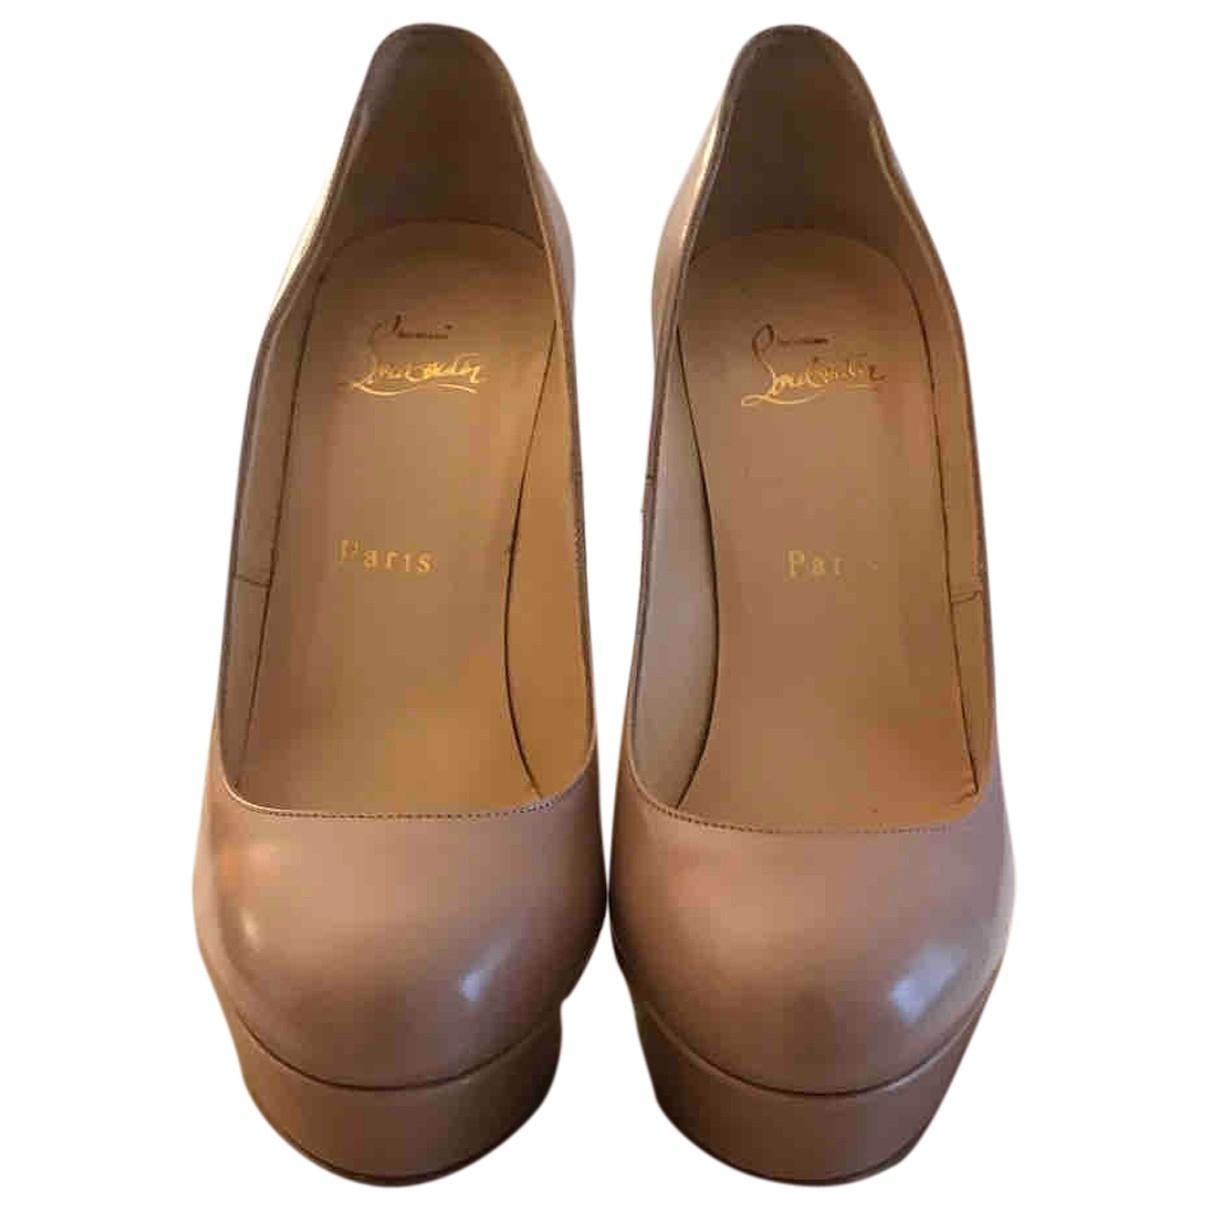 Christian Louboutin Bianca Beige Patent leather Heels for Women 39 EU